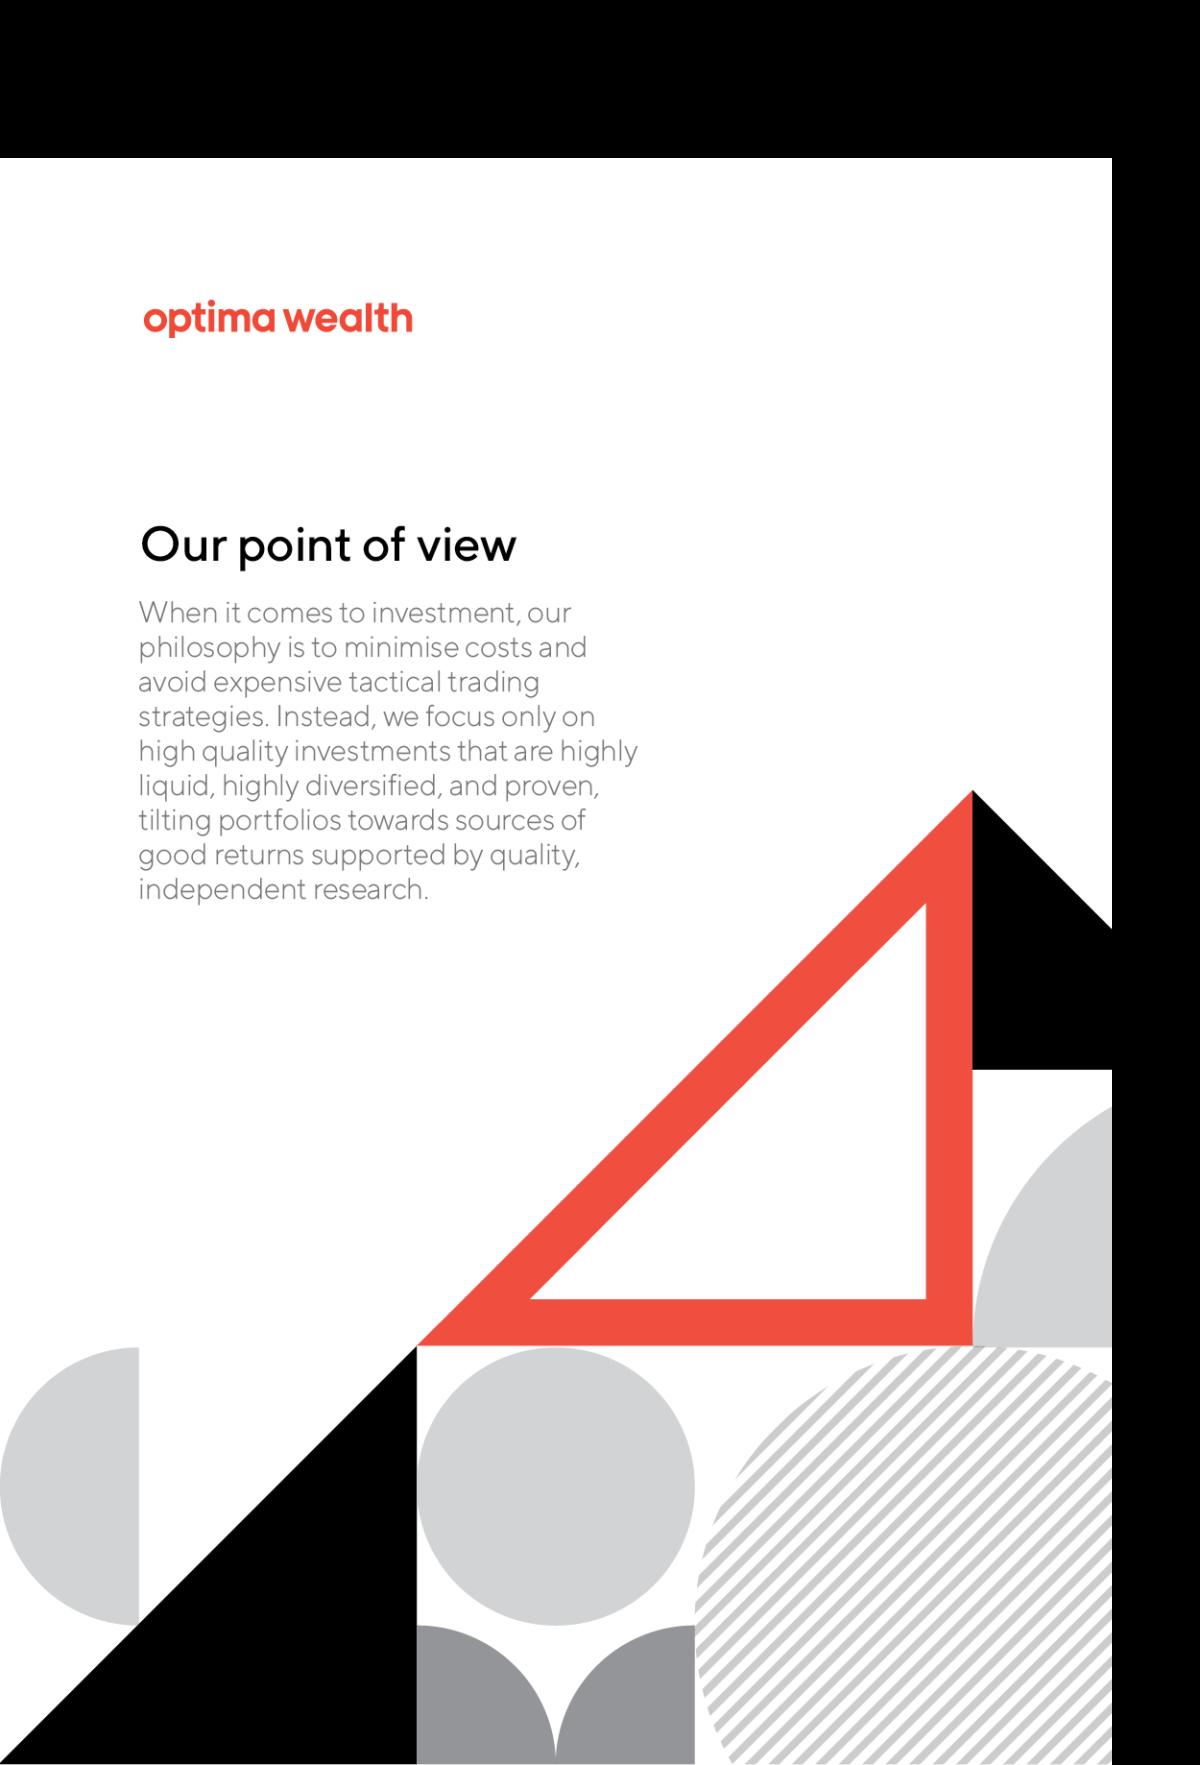 Optima Wealth Brand Images 2020 3